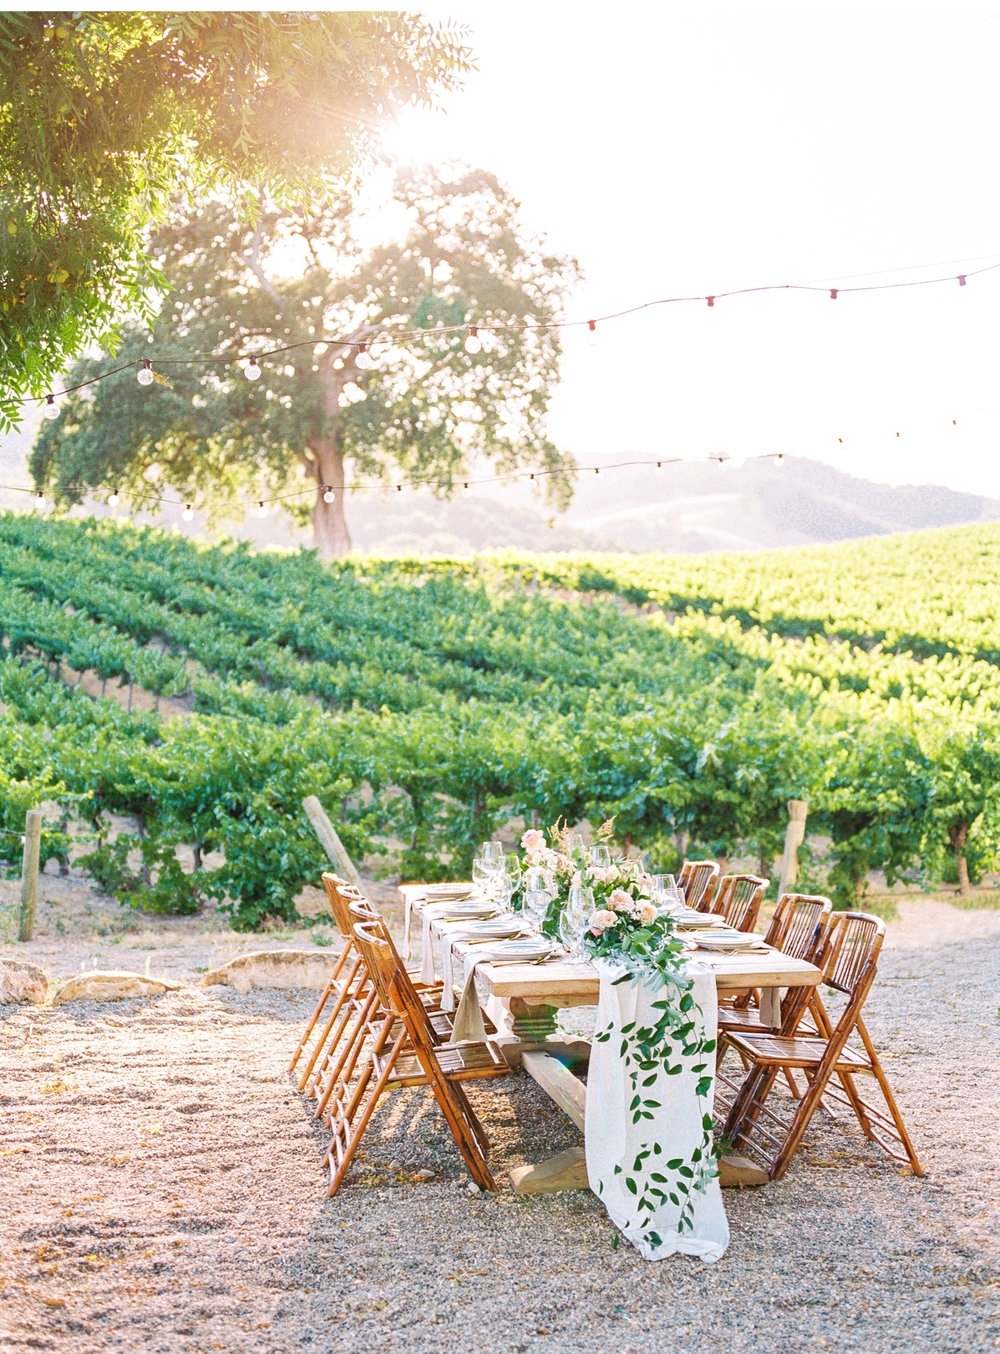 San-Luis-Obispo-Weddings-Natalie-Schutt-Wedding-Photography_08.jpg